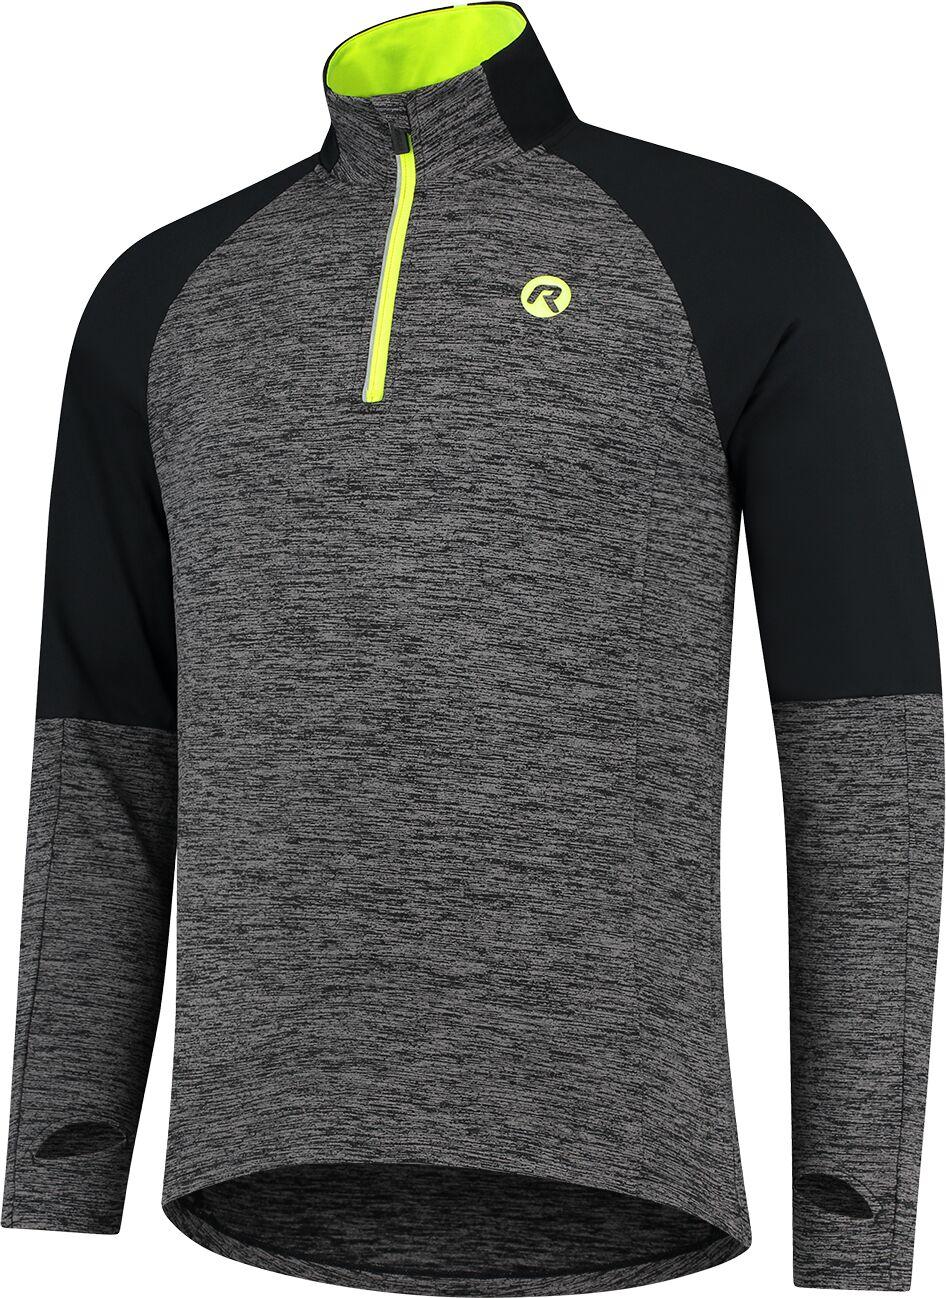 ROGELLI męska bluza do biegania ENJOY black/grey ROG351102 Rozmiar: M,ROG351102.S